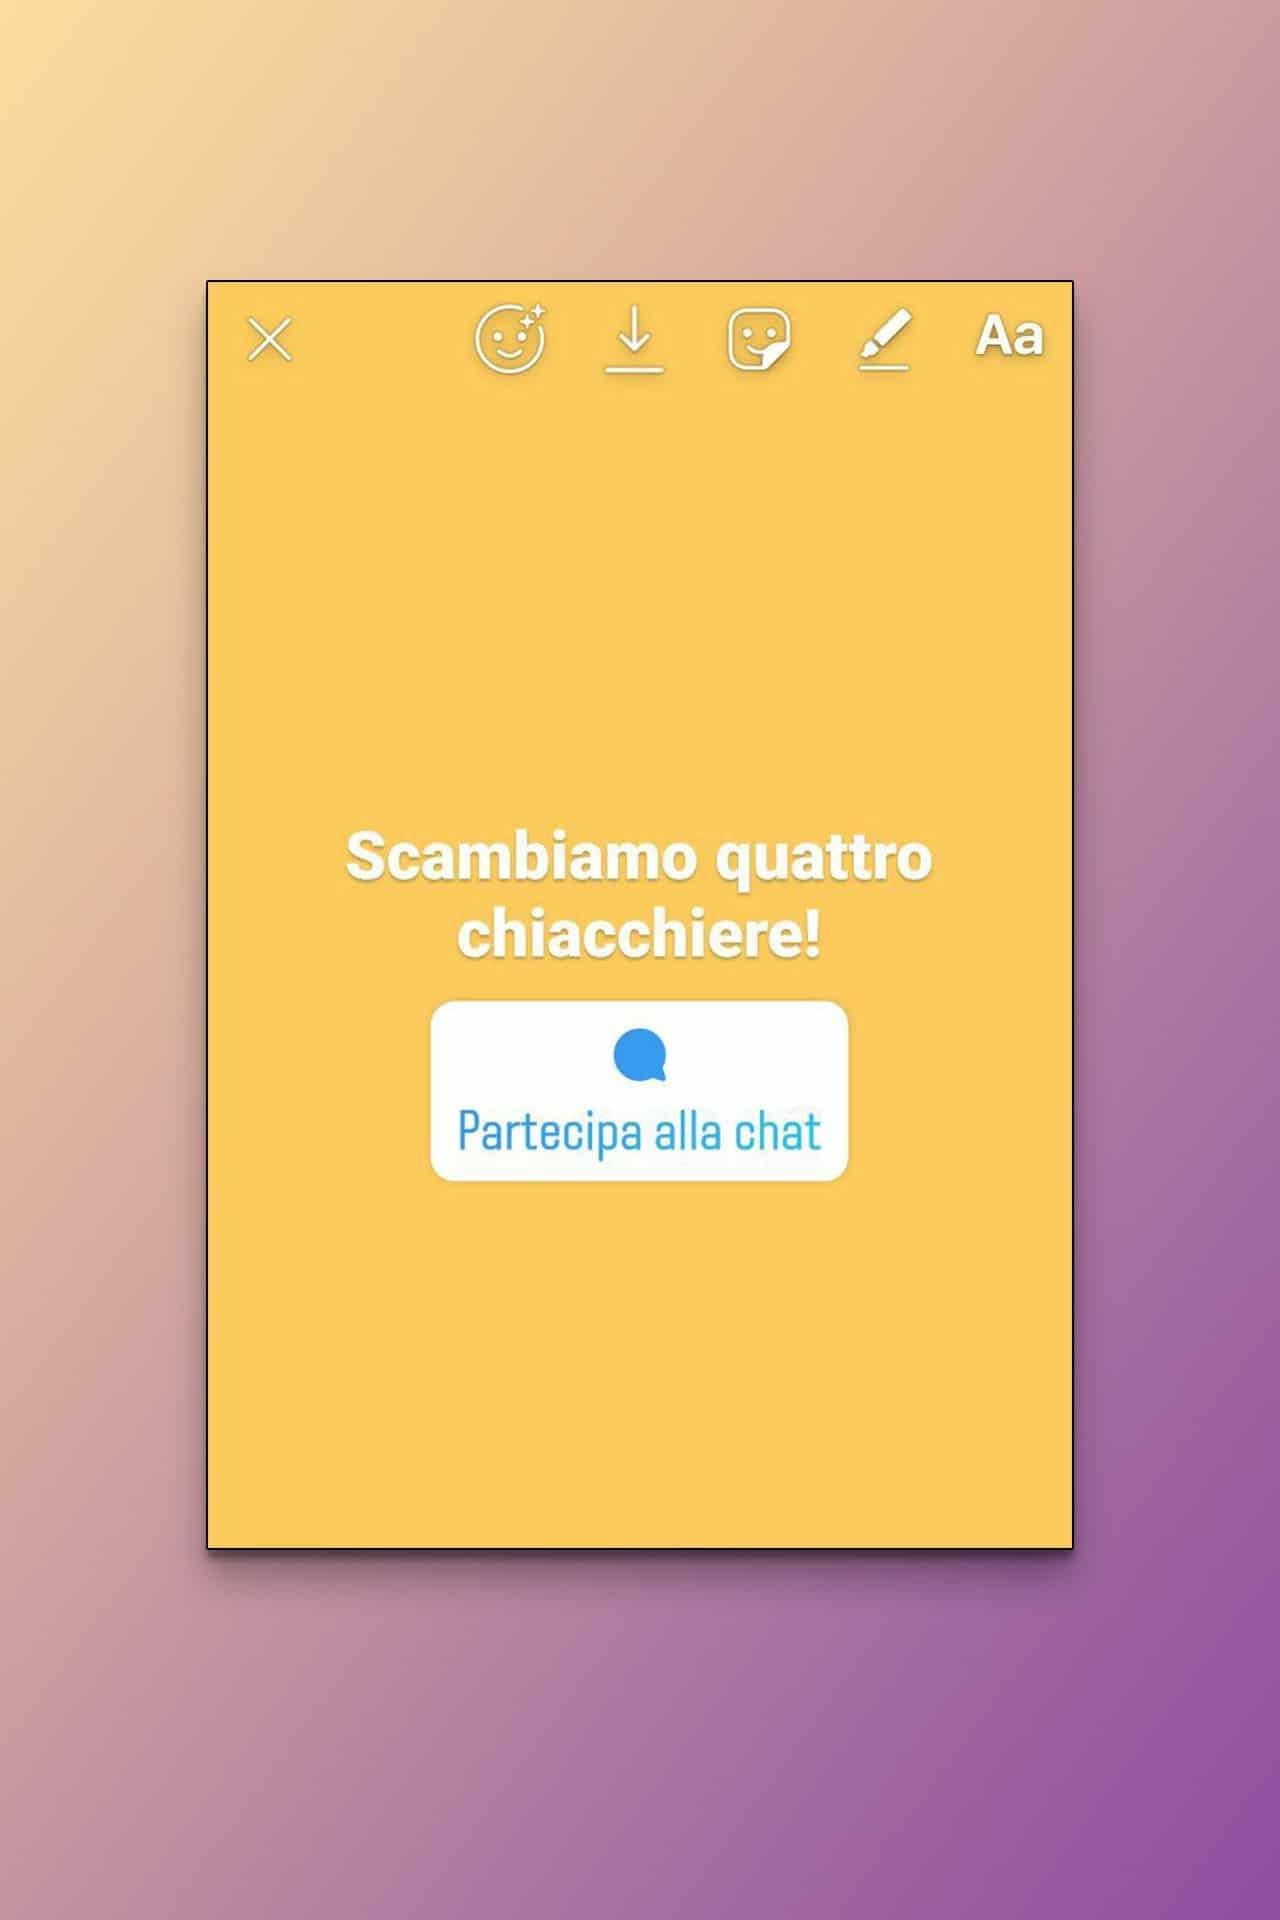 Instagram introduce Sticker chat